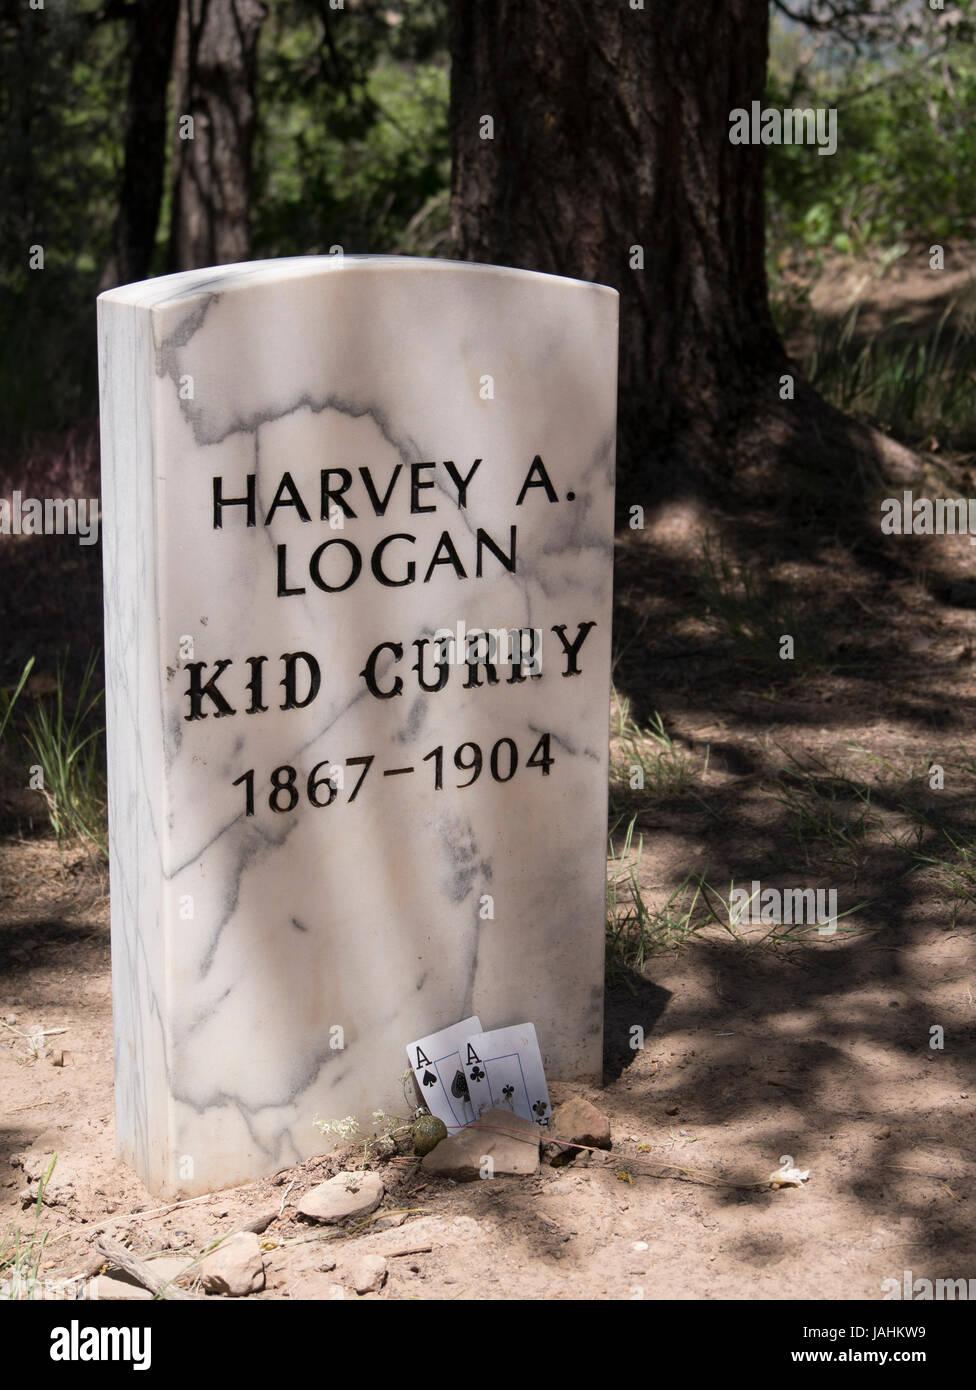 Kid Curry (Harvey A Logan) grave memorial, Linwood Cemetery, Glenwood Springs, Colorado. - Stock Image